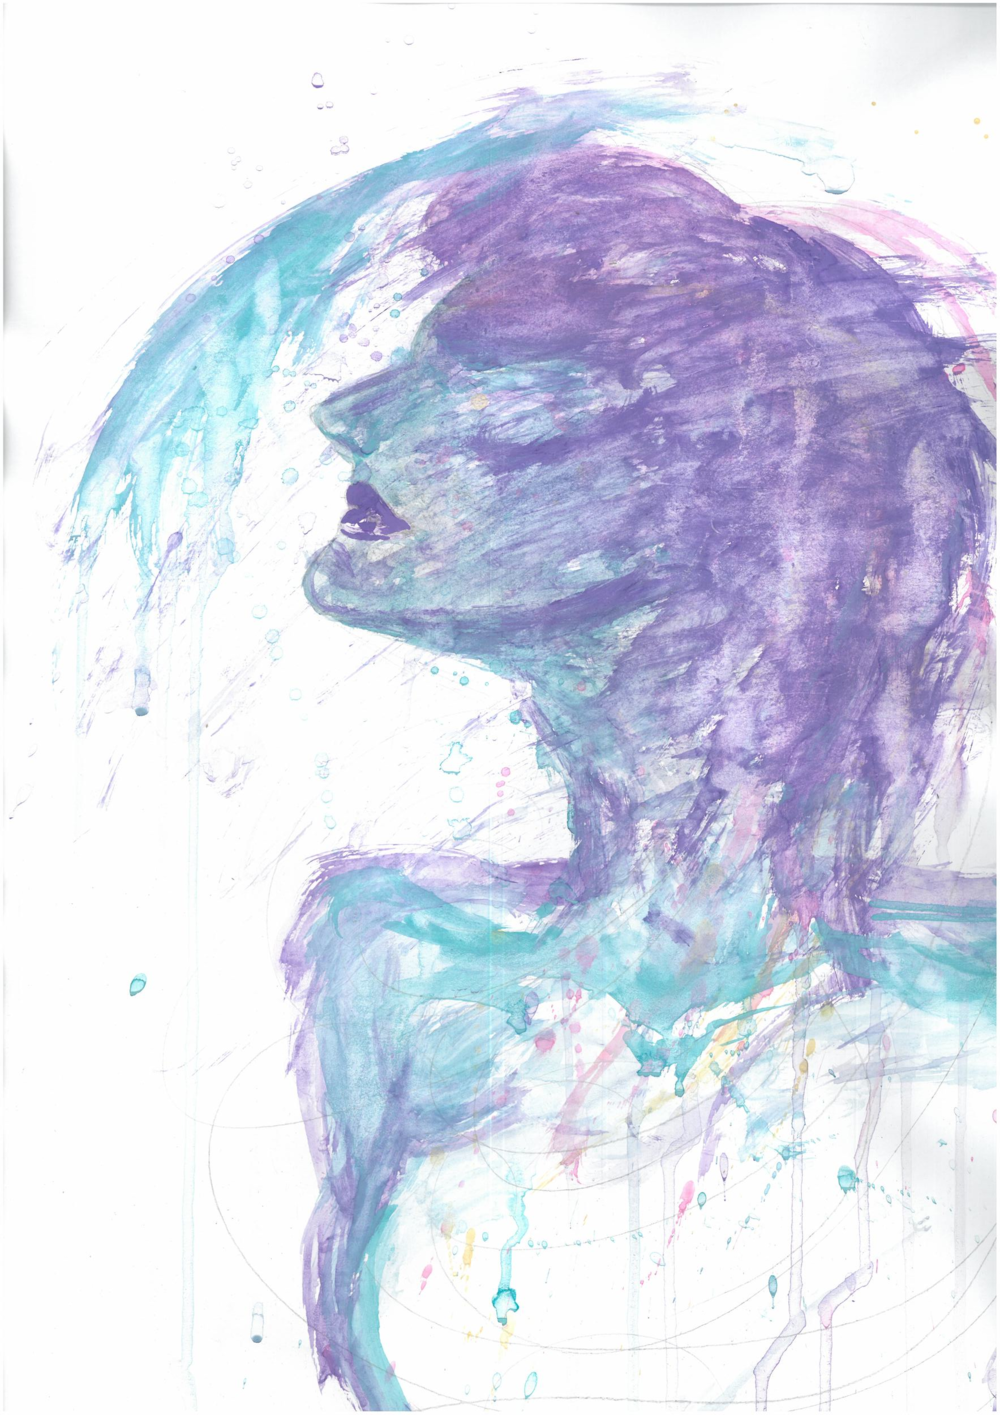 Artwork by Malini Mohana